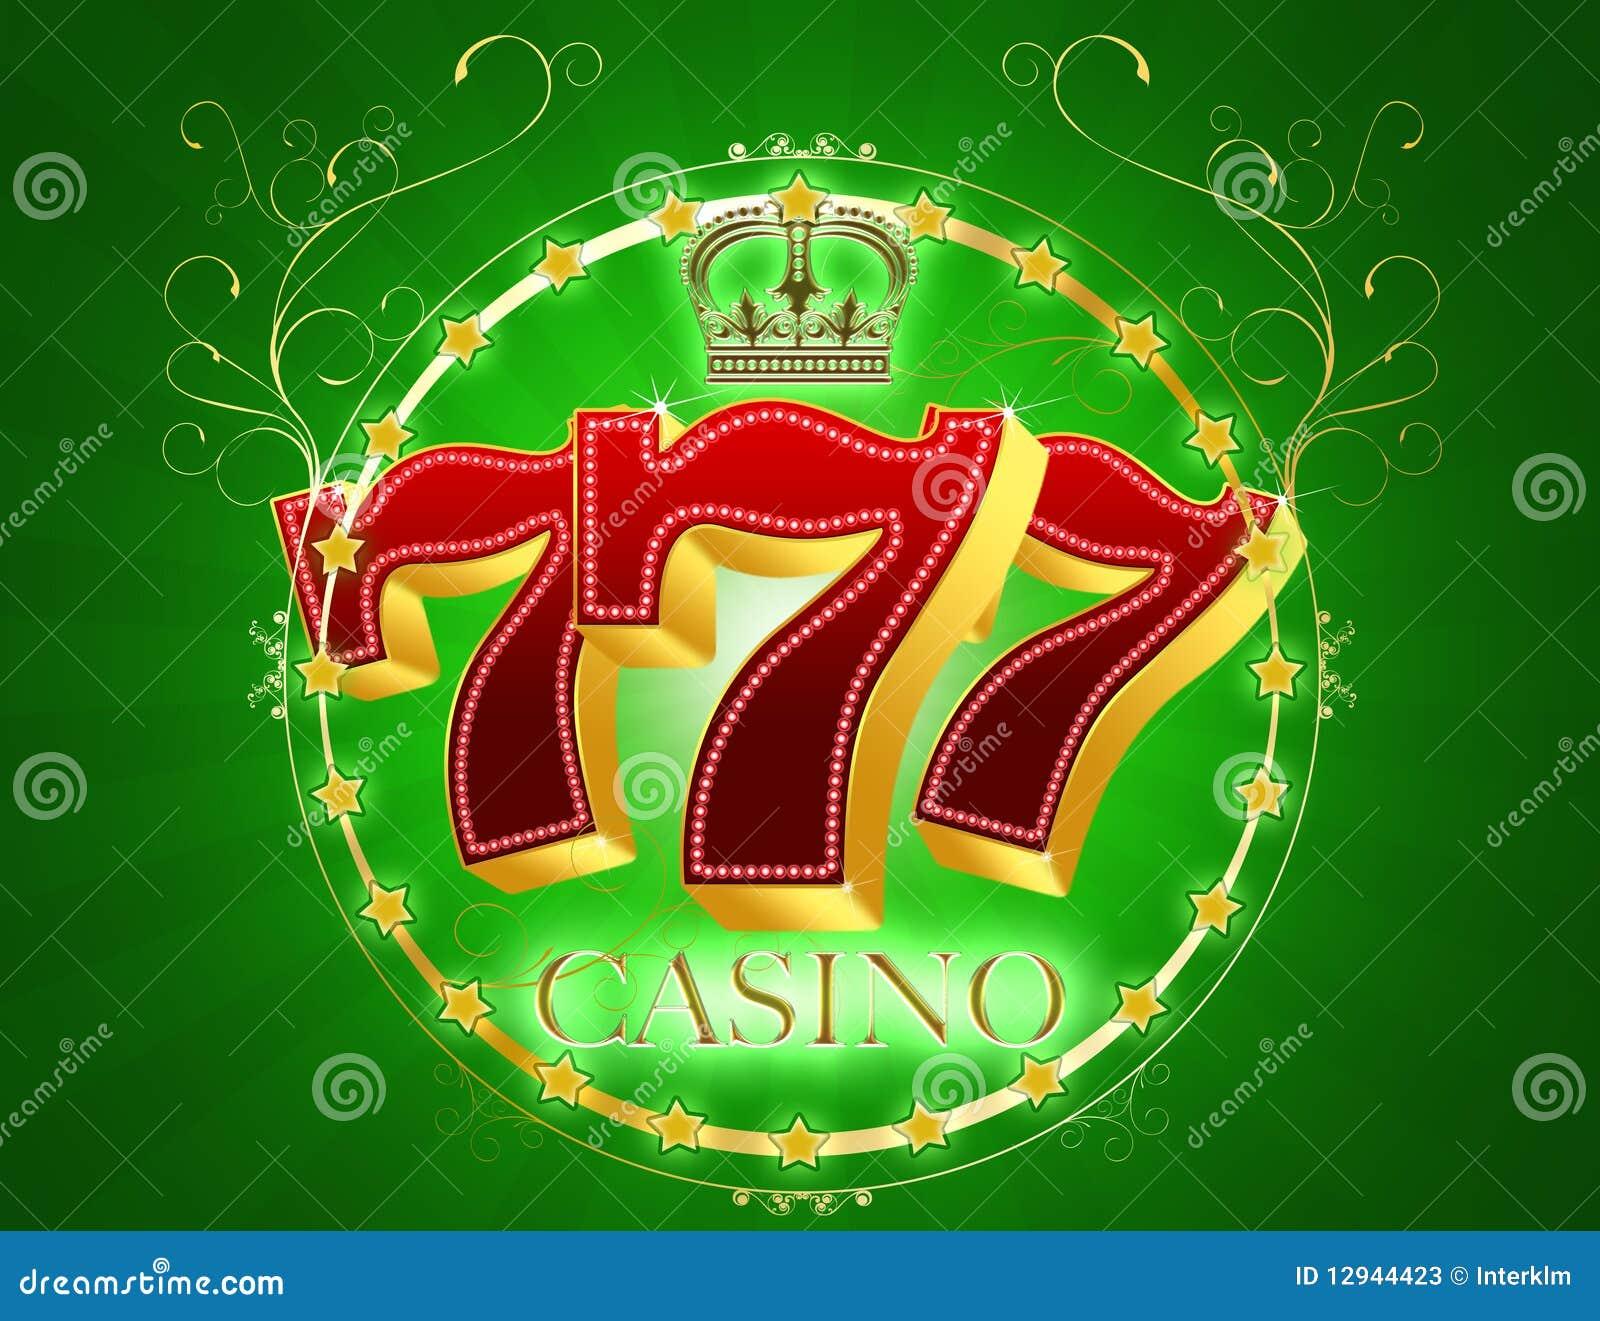 Golden nugget online casino ej thomas